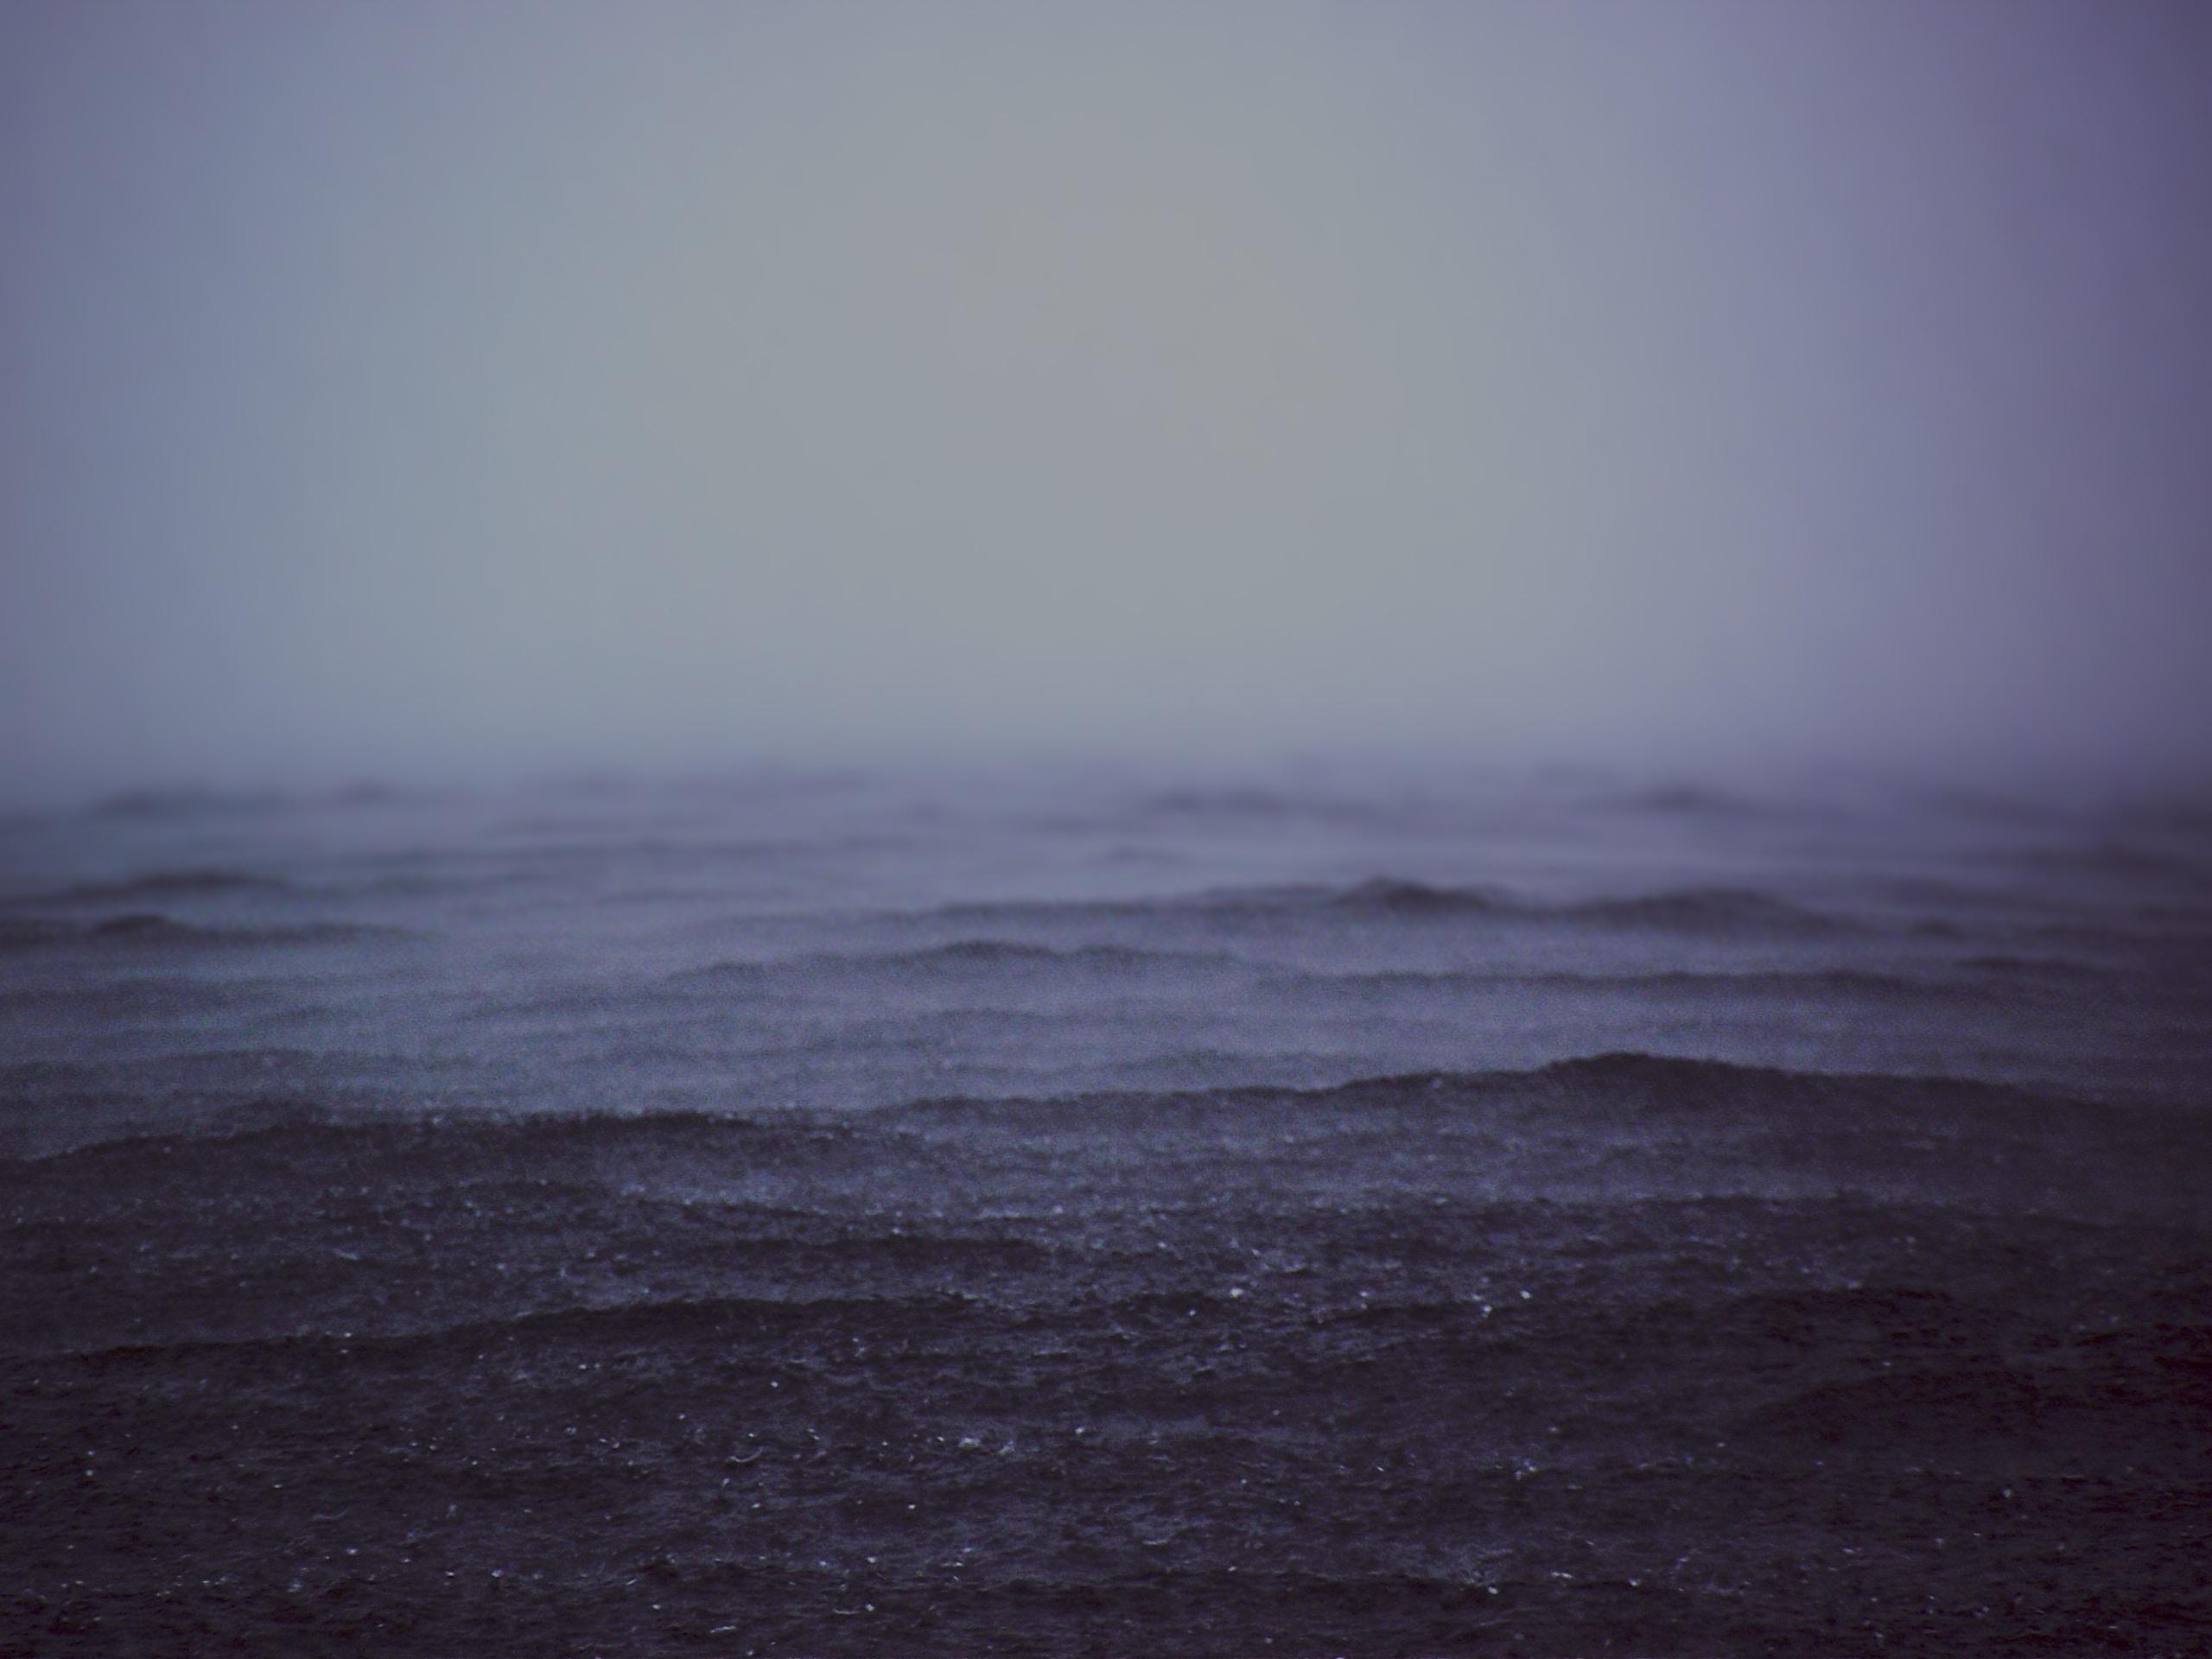 Rain falls into dark stormy waters